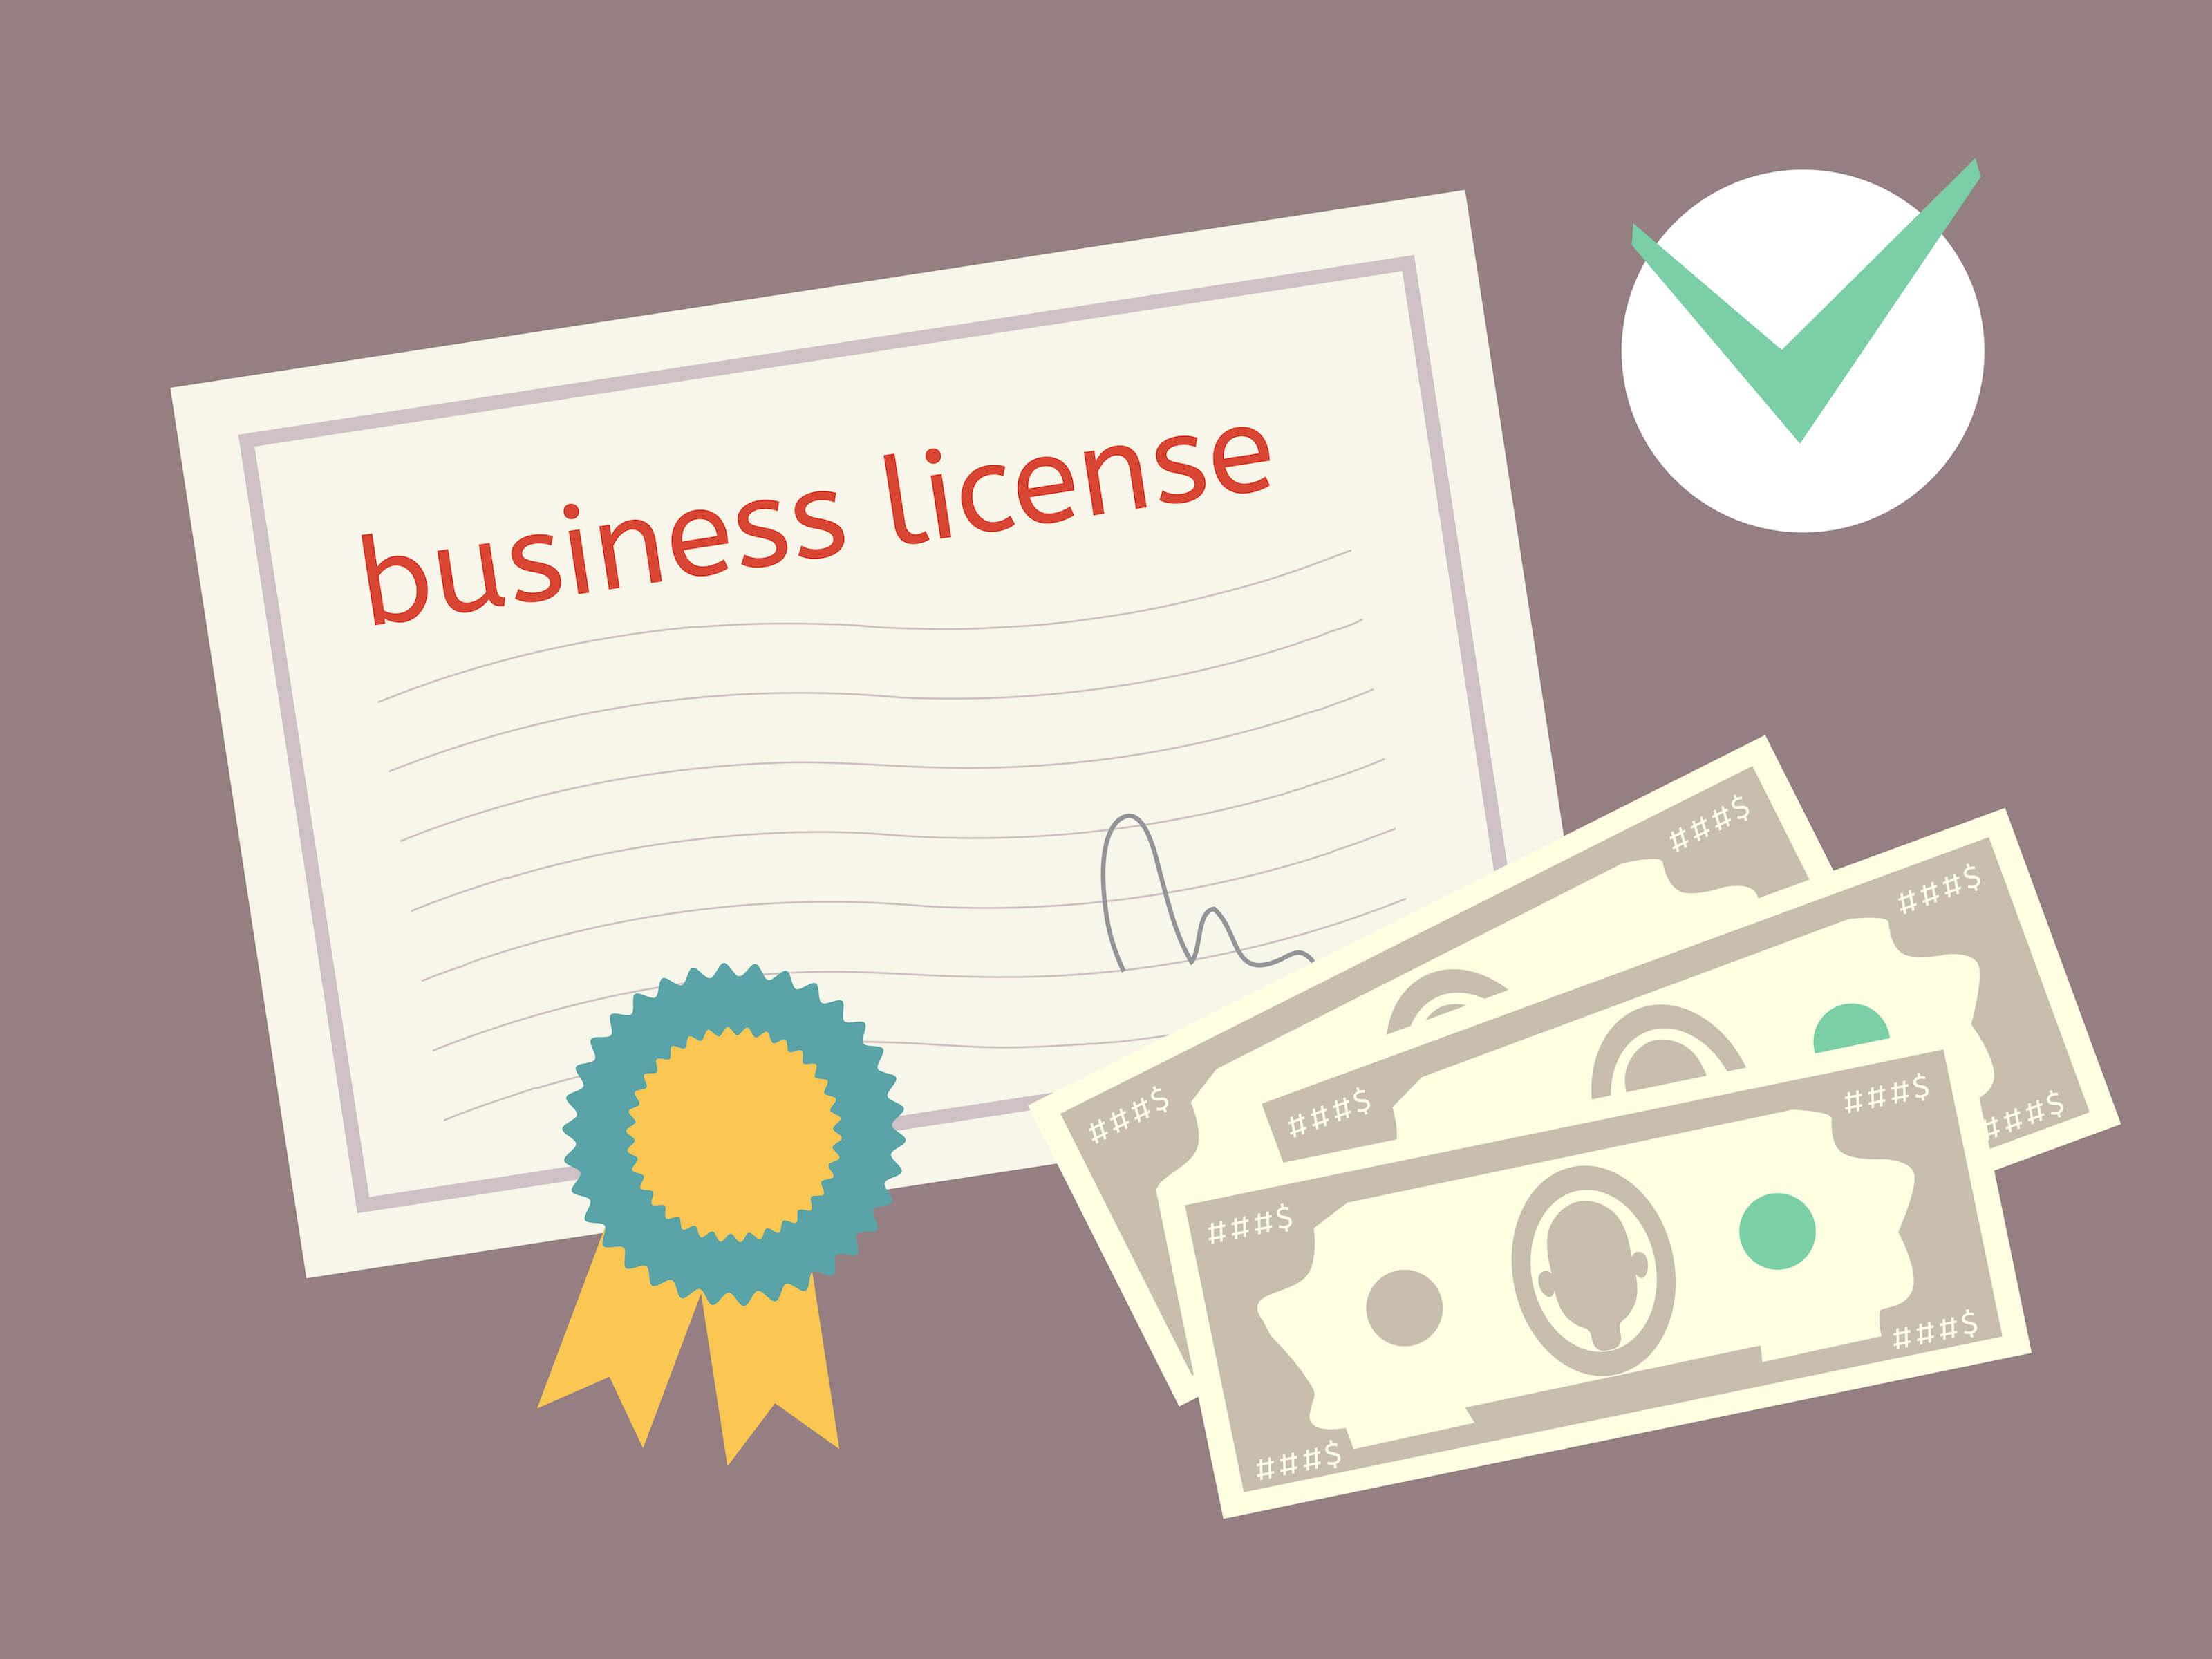 Who should establish an LLC?